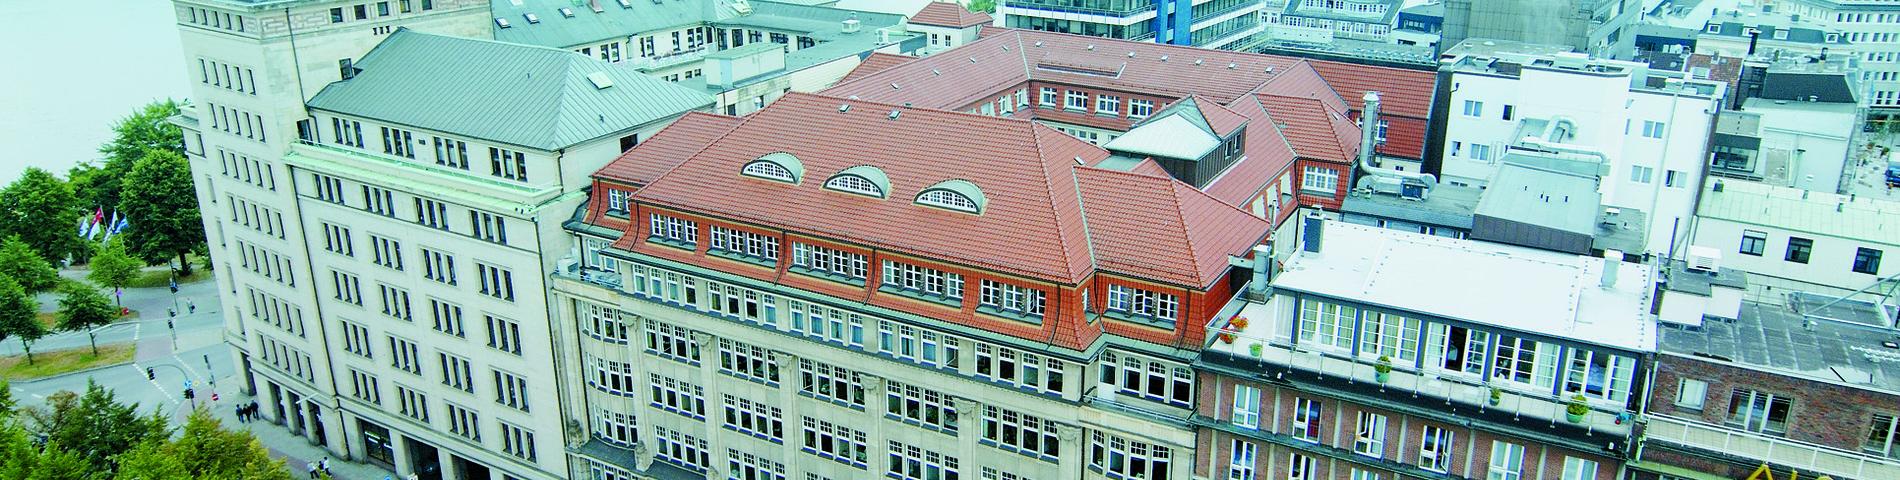 DID Deutsch-Institut picture 1